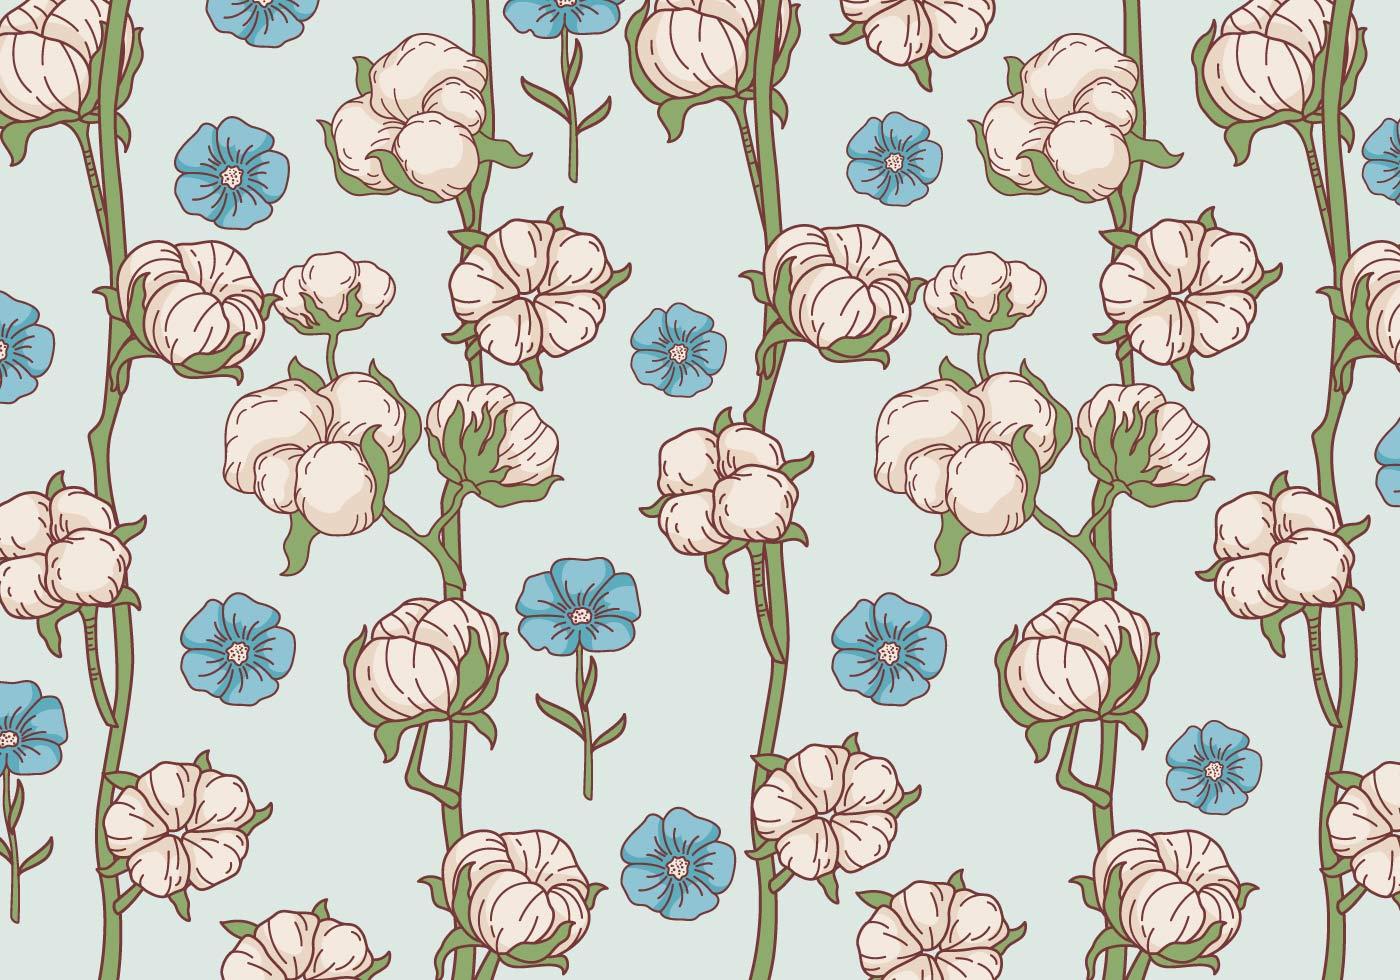 Cotton Flower Pattern Vector Download Free Vector Art Stock Graphics &